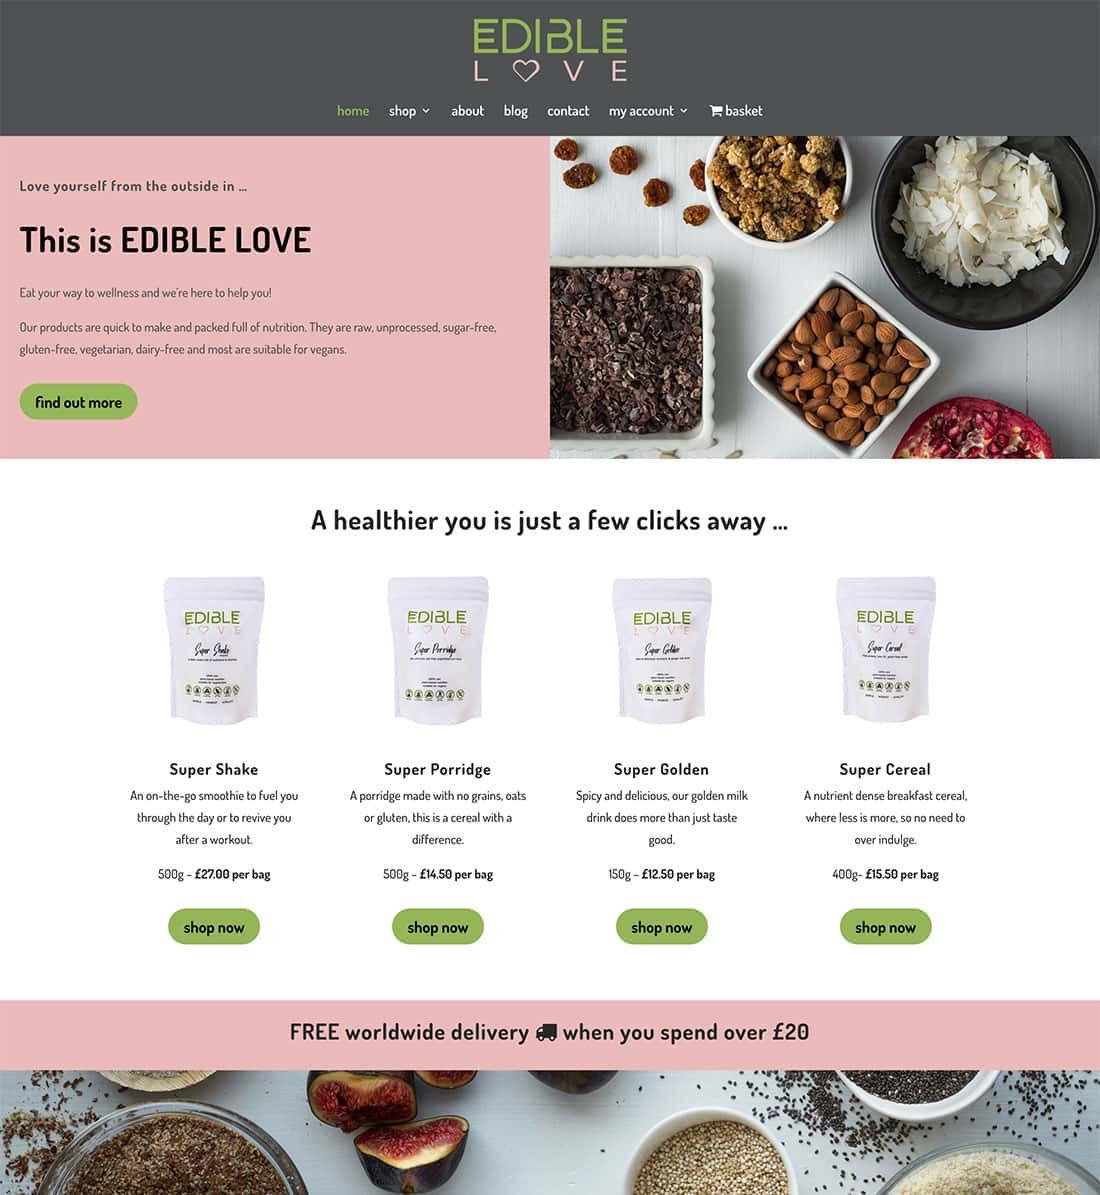 Edible Love homepage design